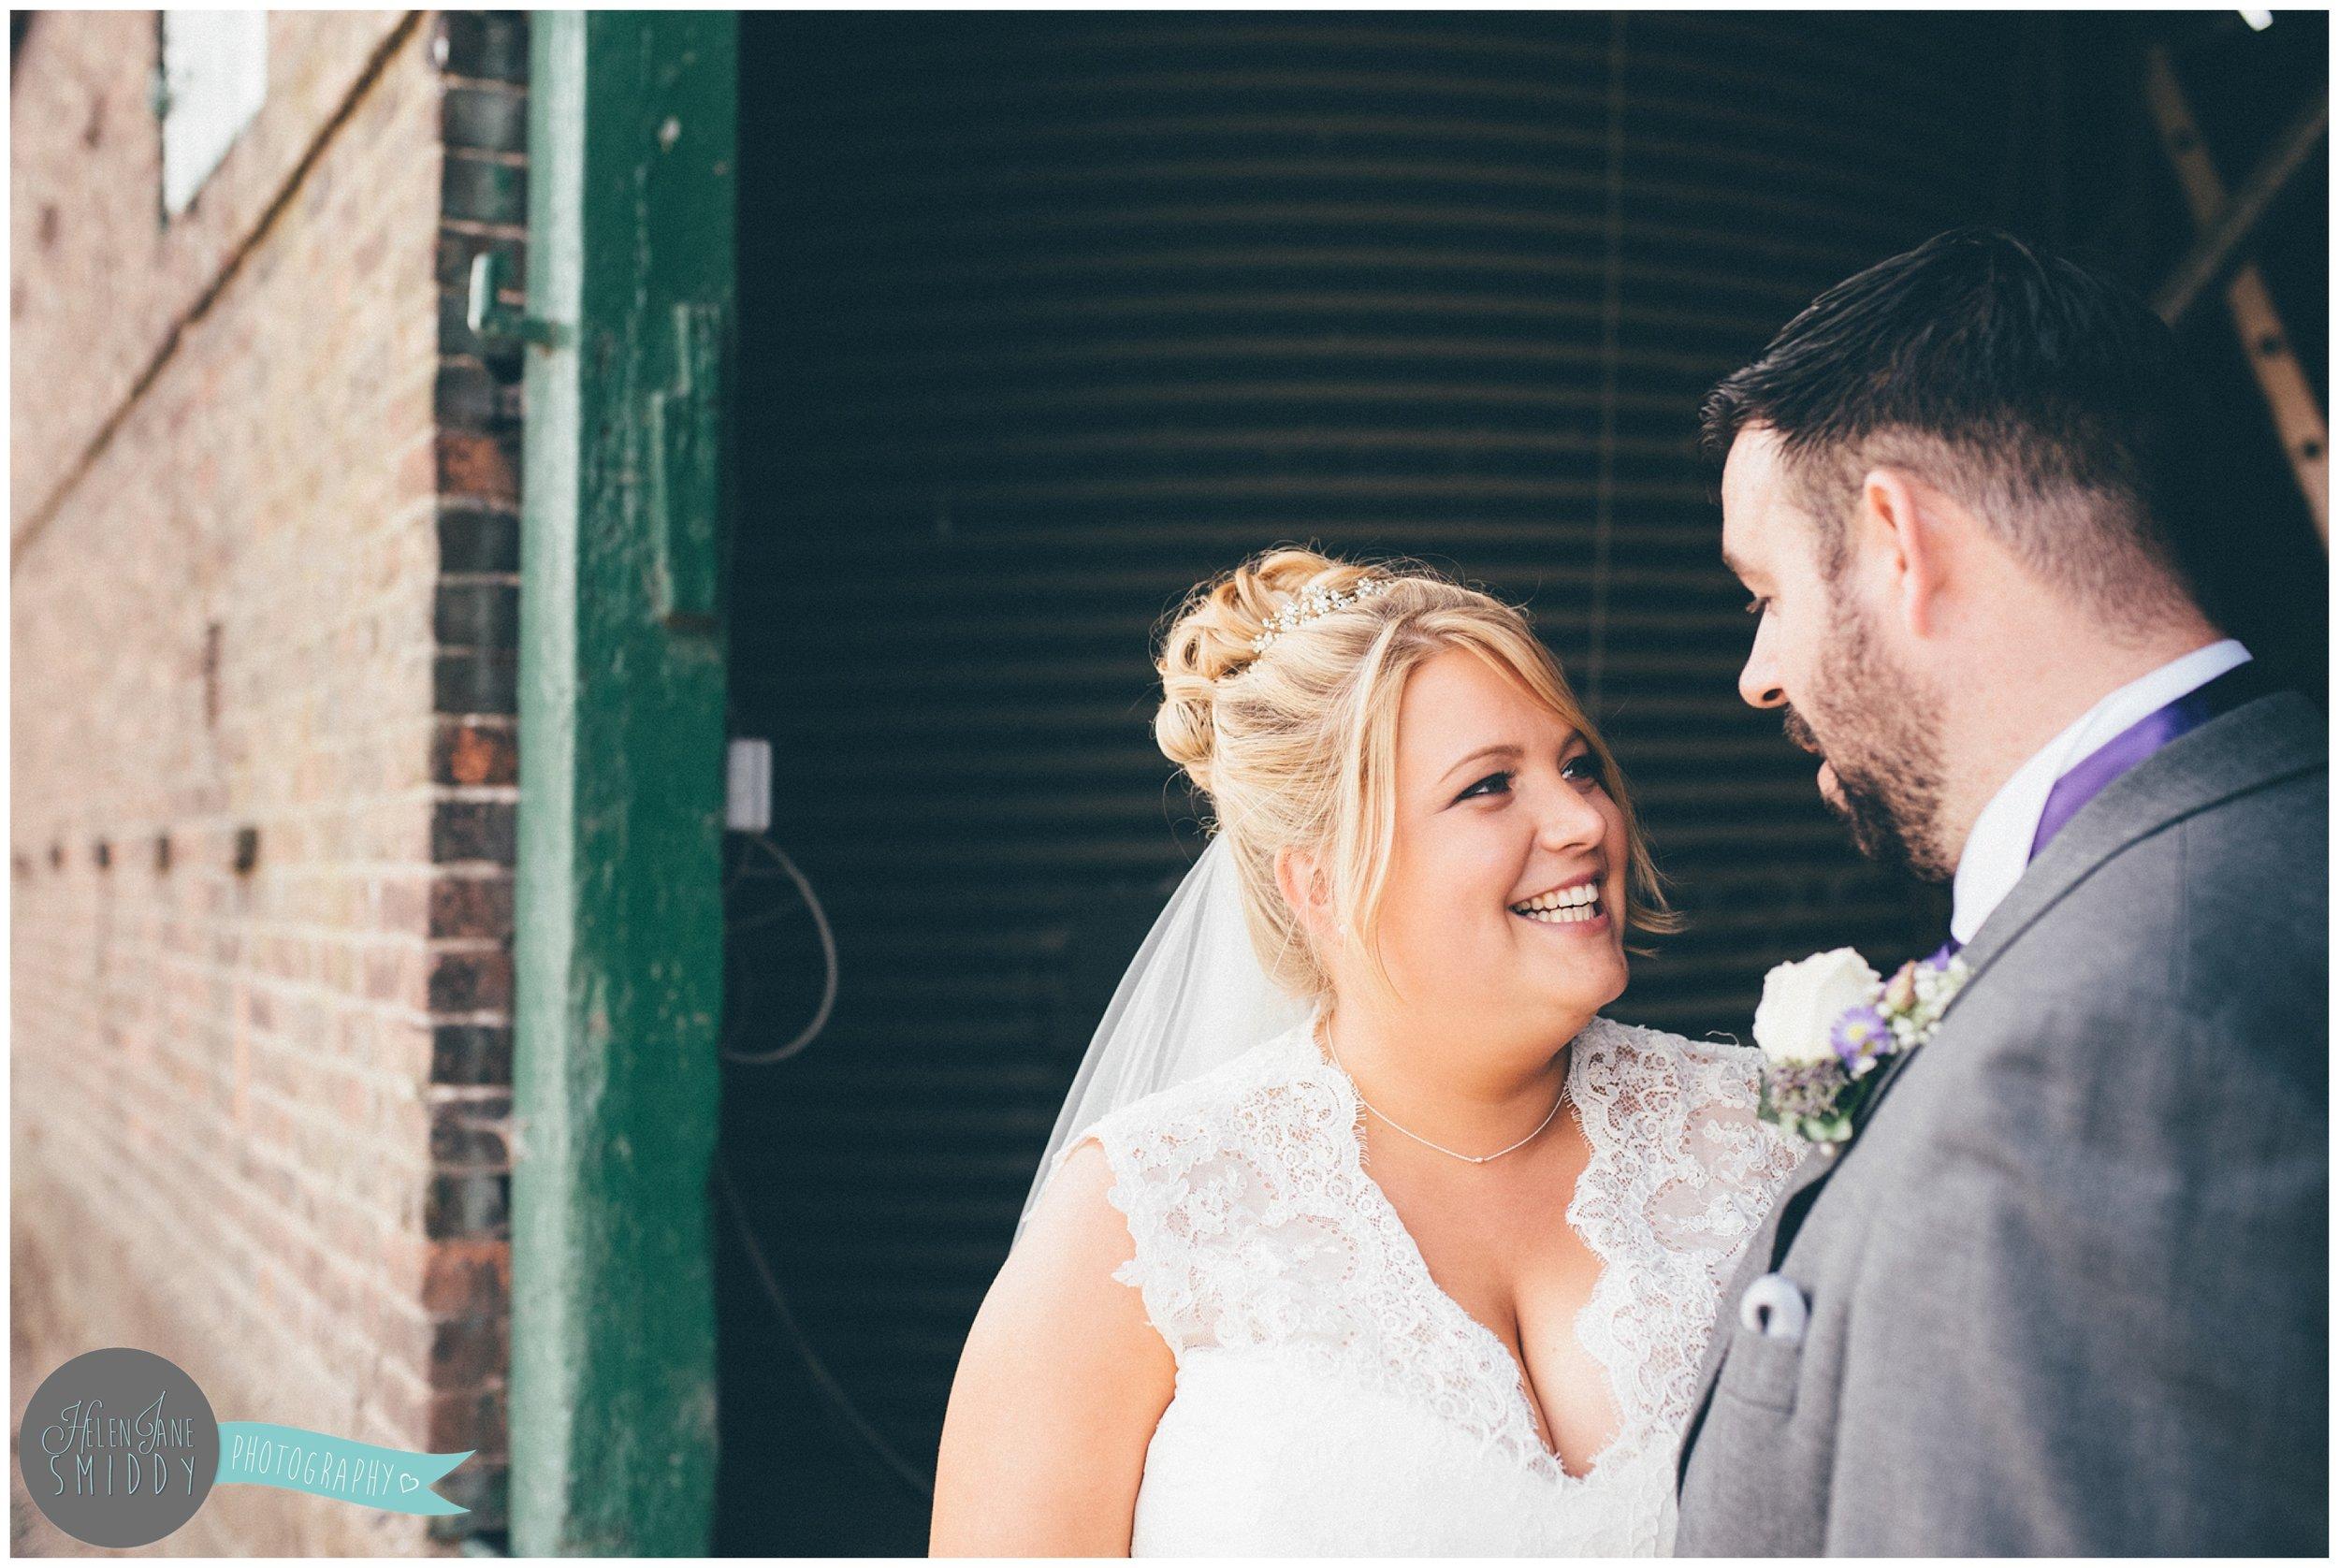 farm-farmwedding-cheshire-cheshirewedding-DIY-bride-cheshirephotographer-cheshireweddingphotographer-frodsham-bride-brideandgroom